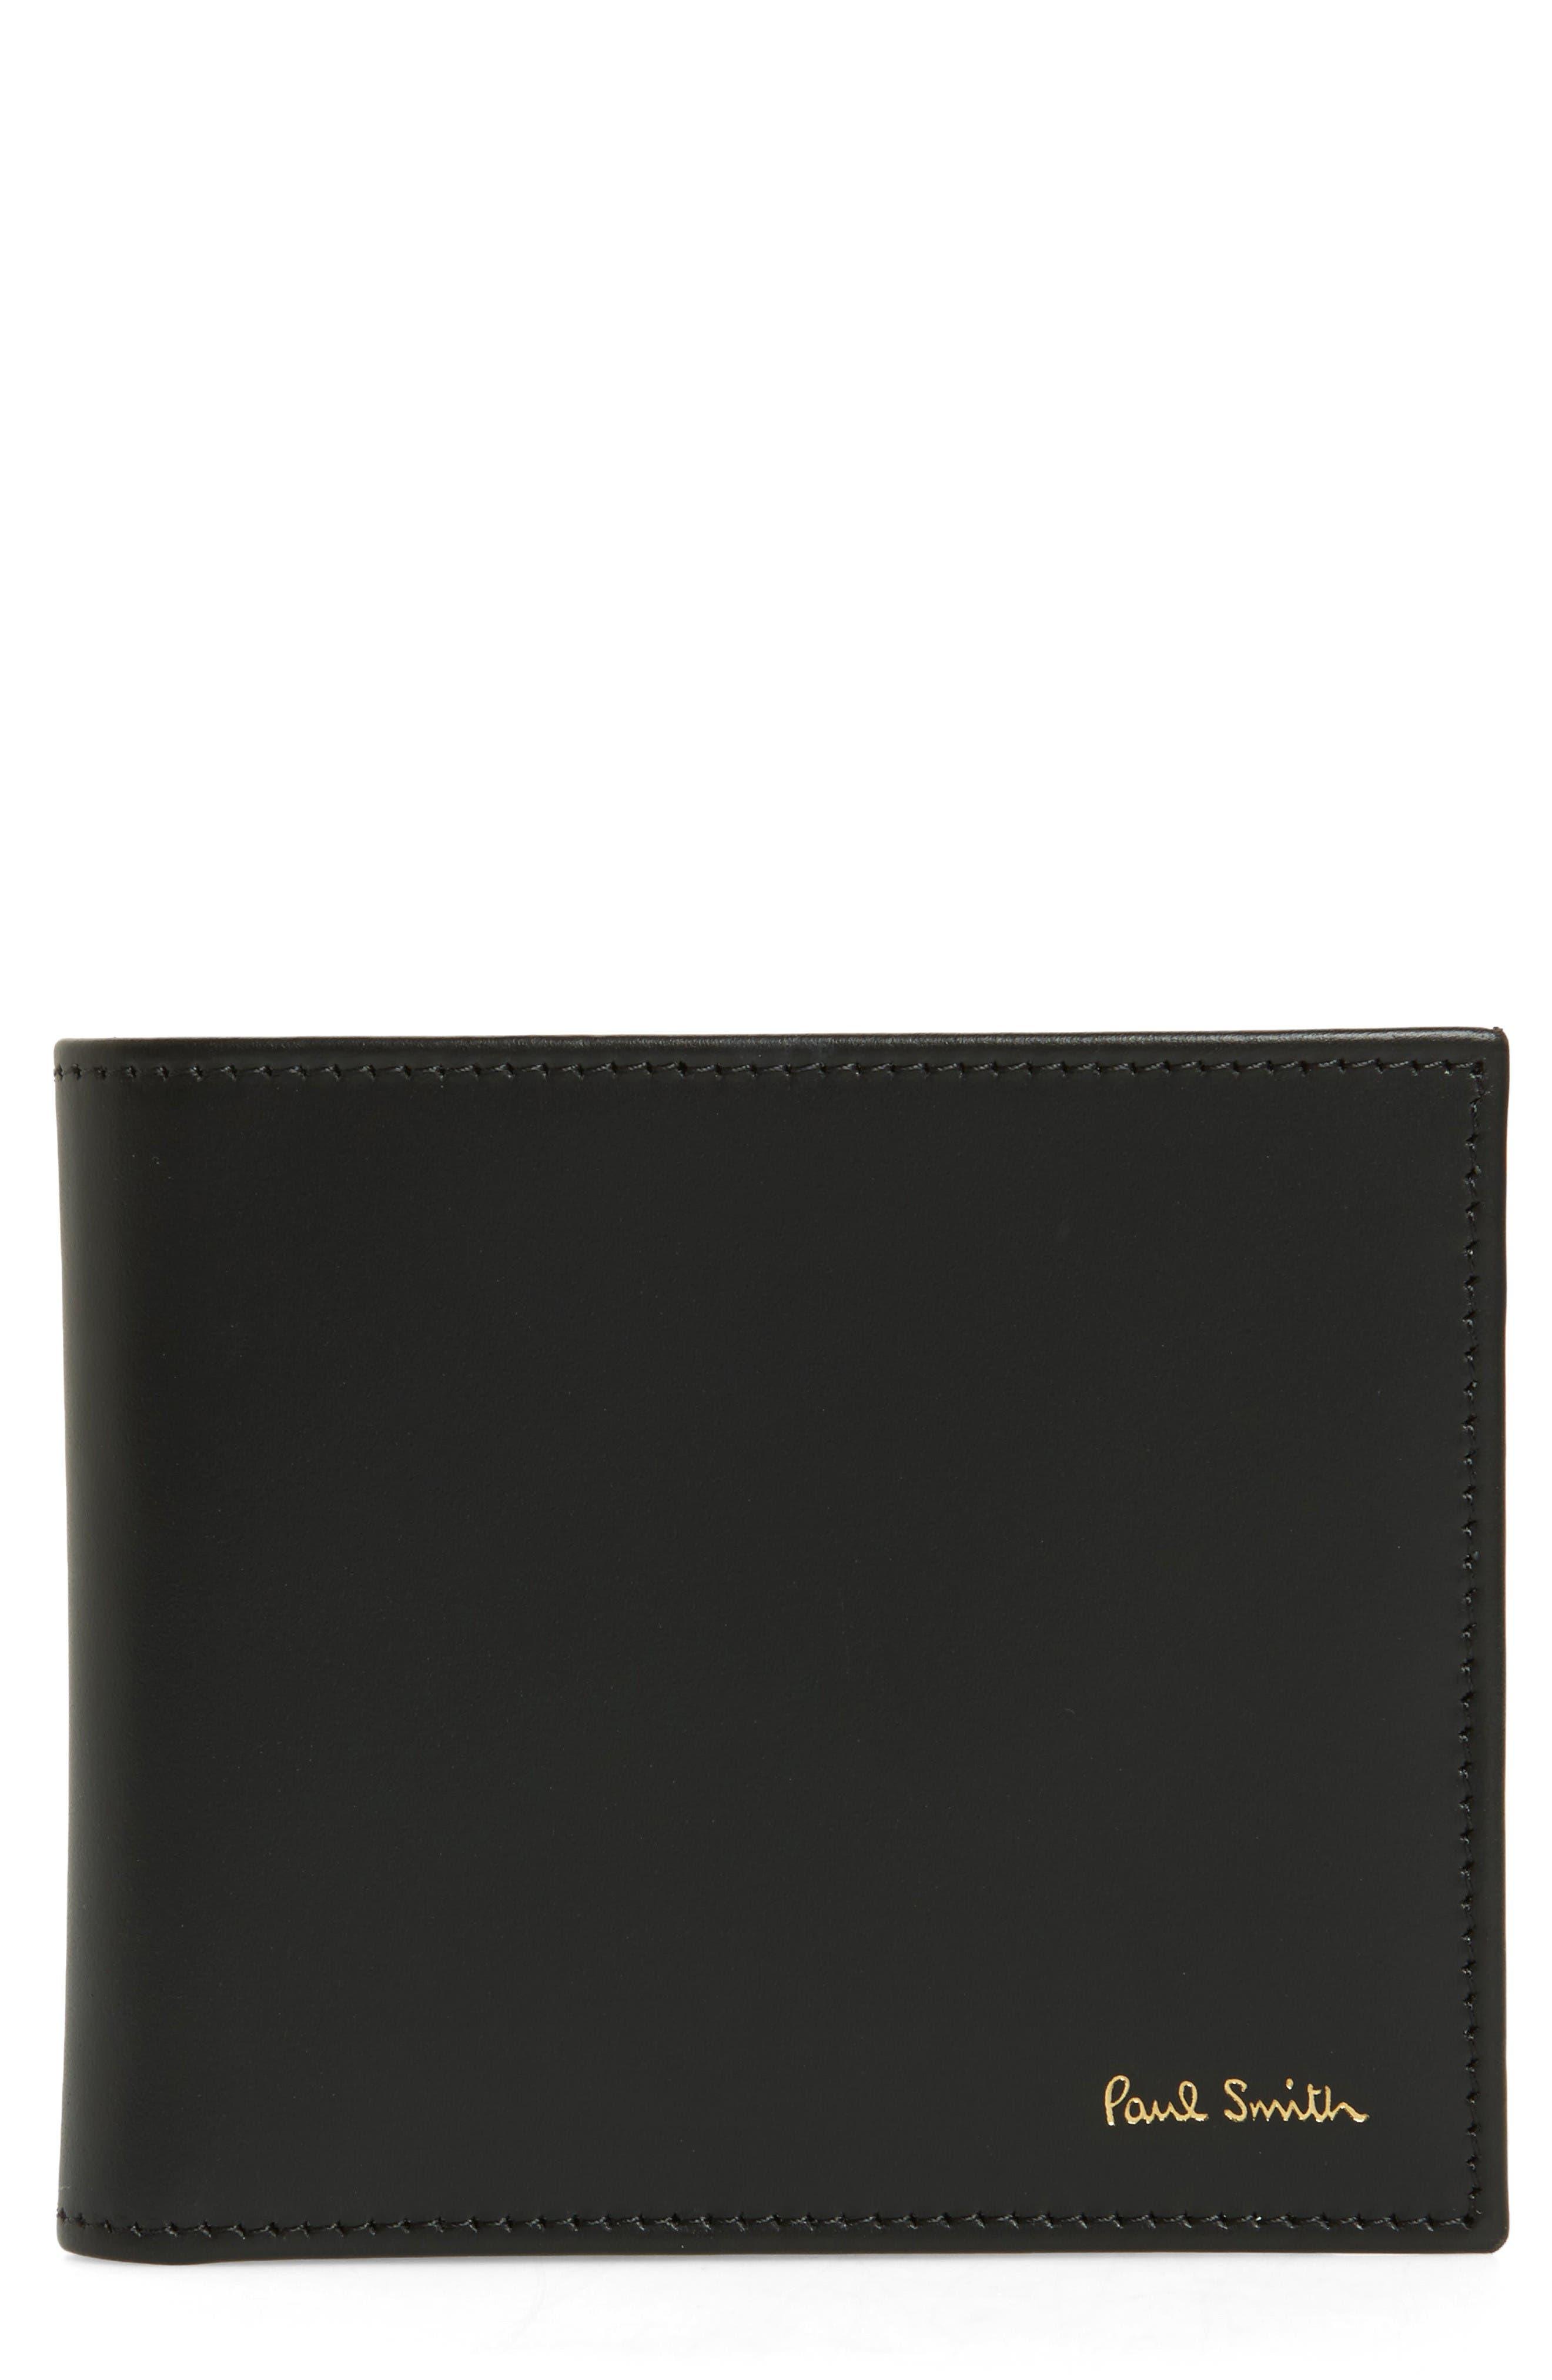 Paul Smith Multistripe Calfskin Leather Billfold